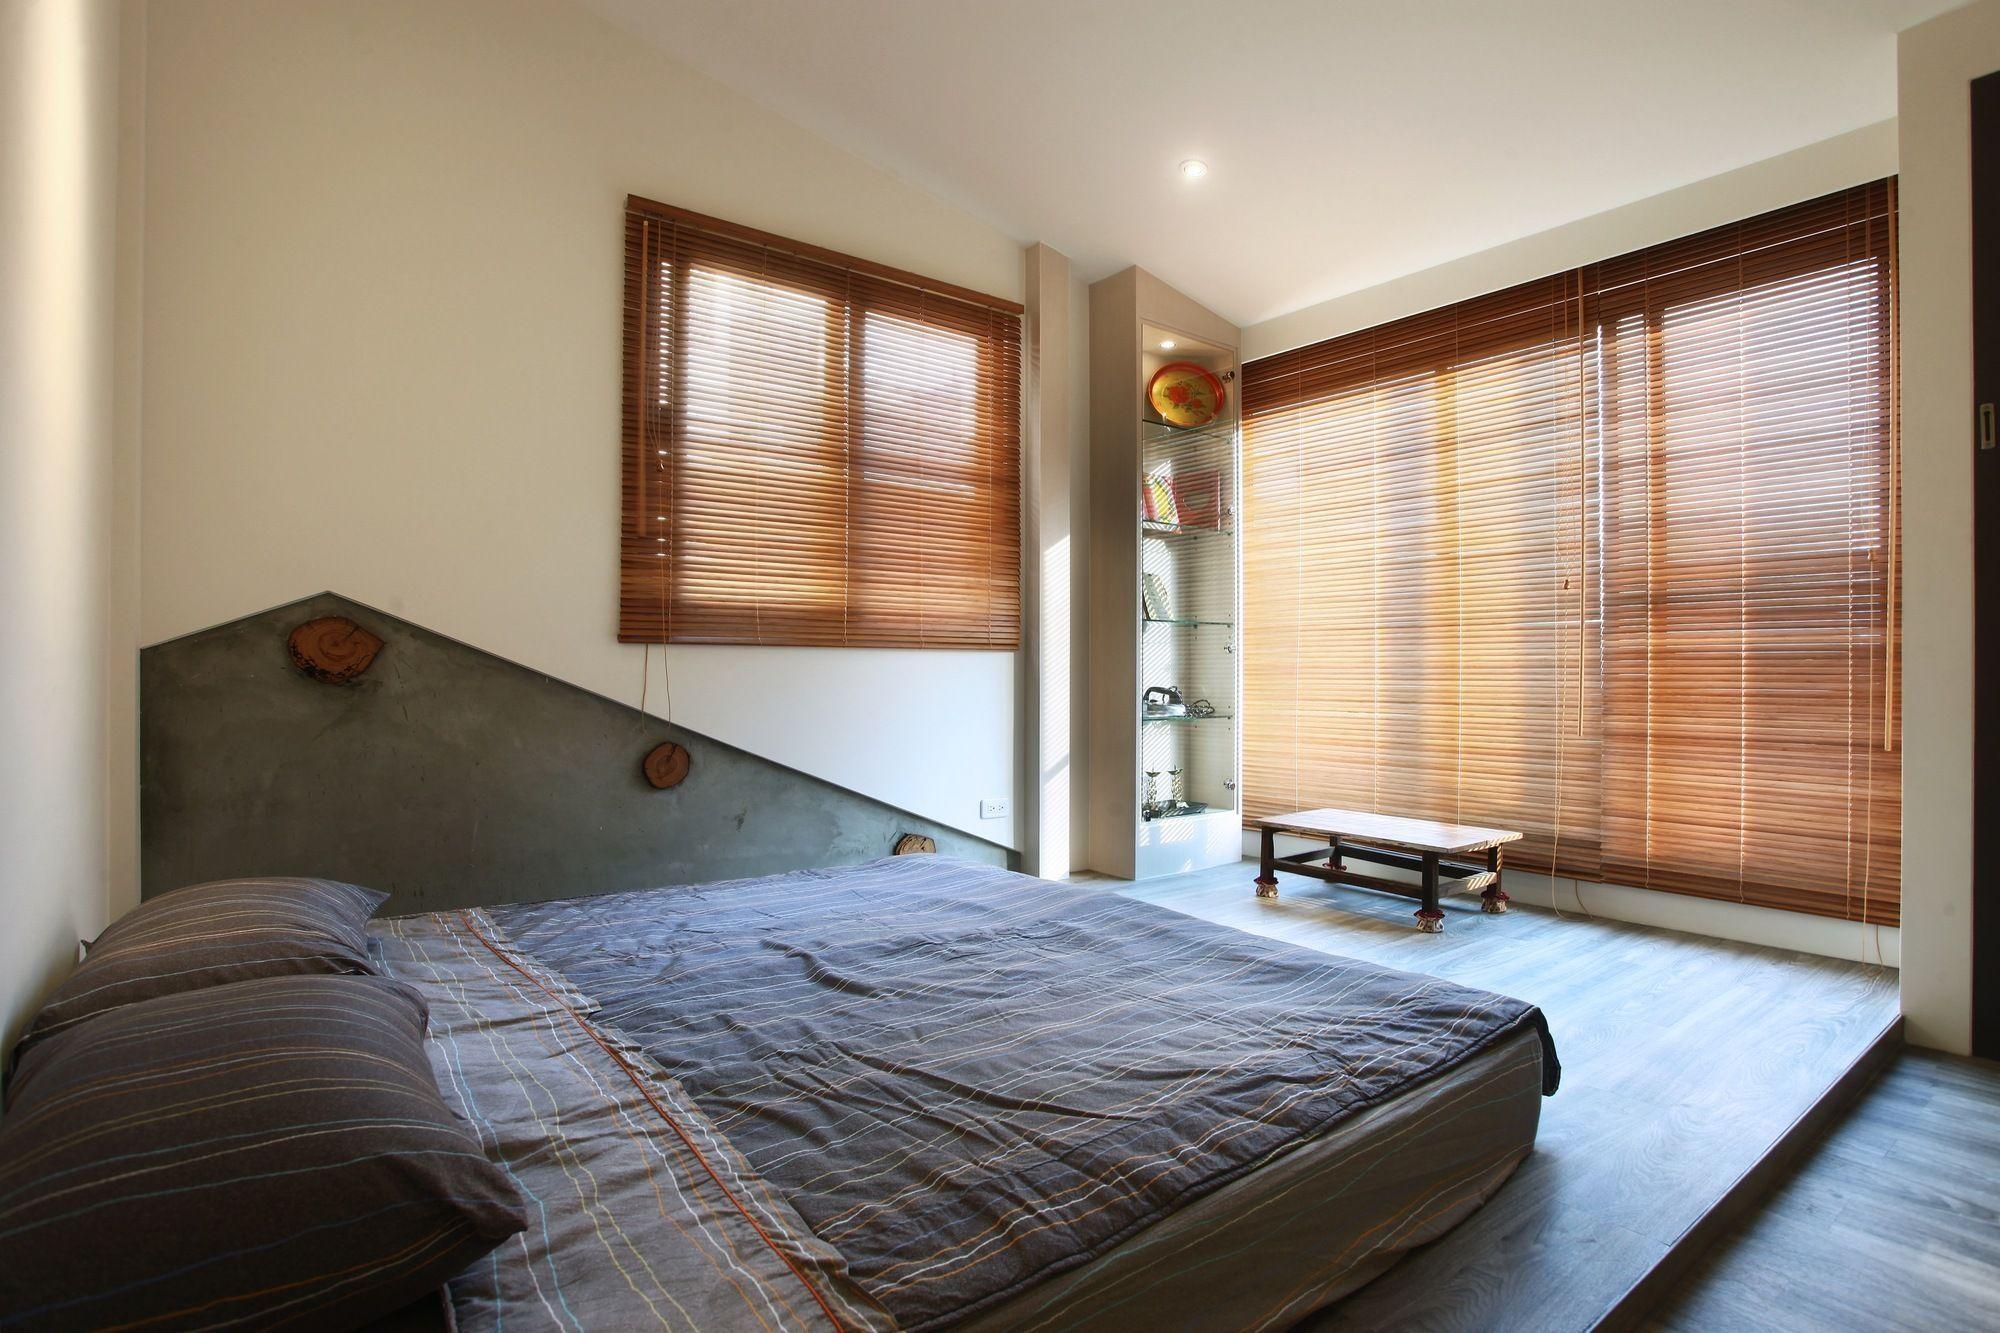 Nice 47 Minimalist Interior Design Inspiration Httpkindofdecorcomindex